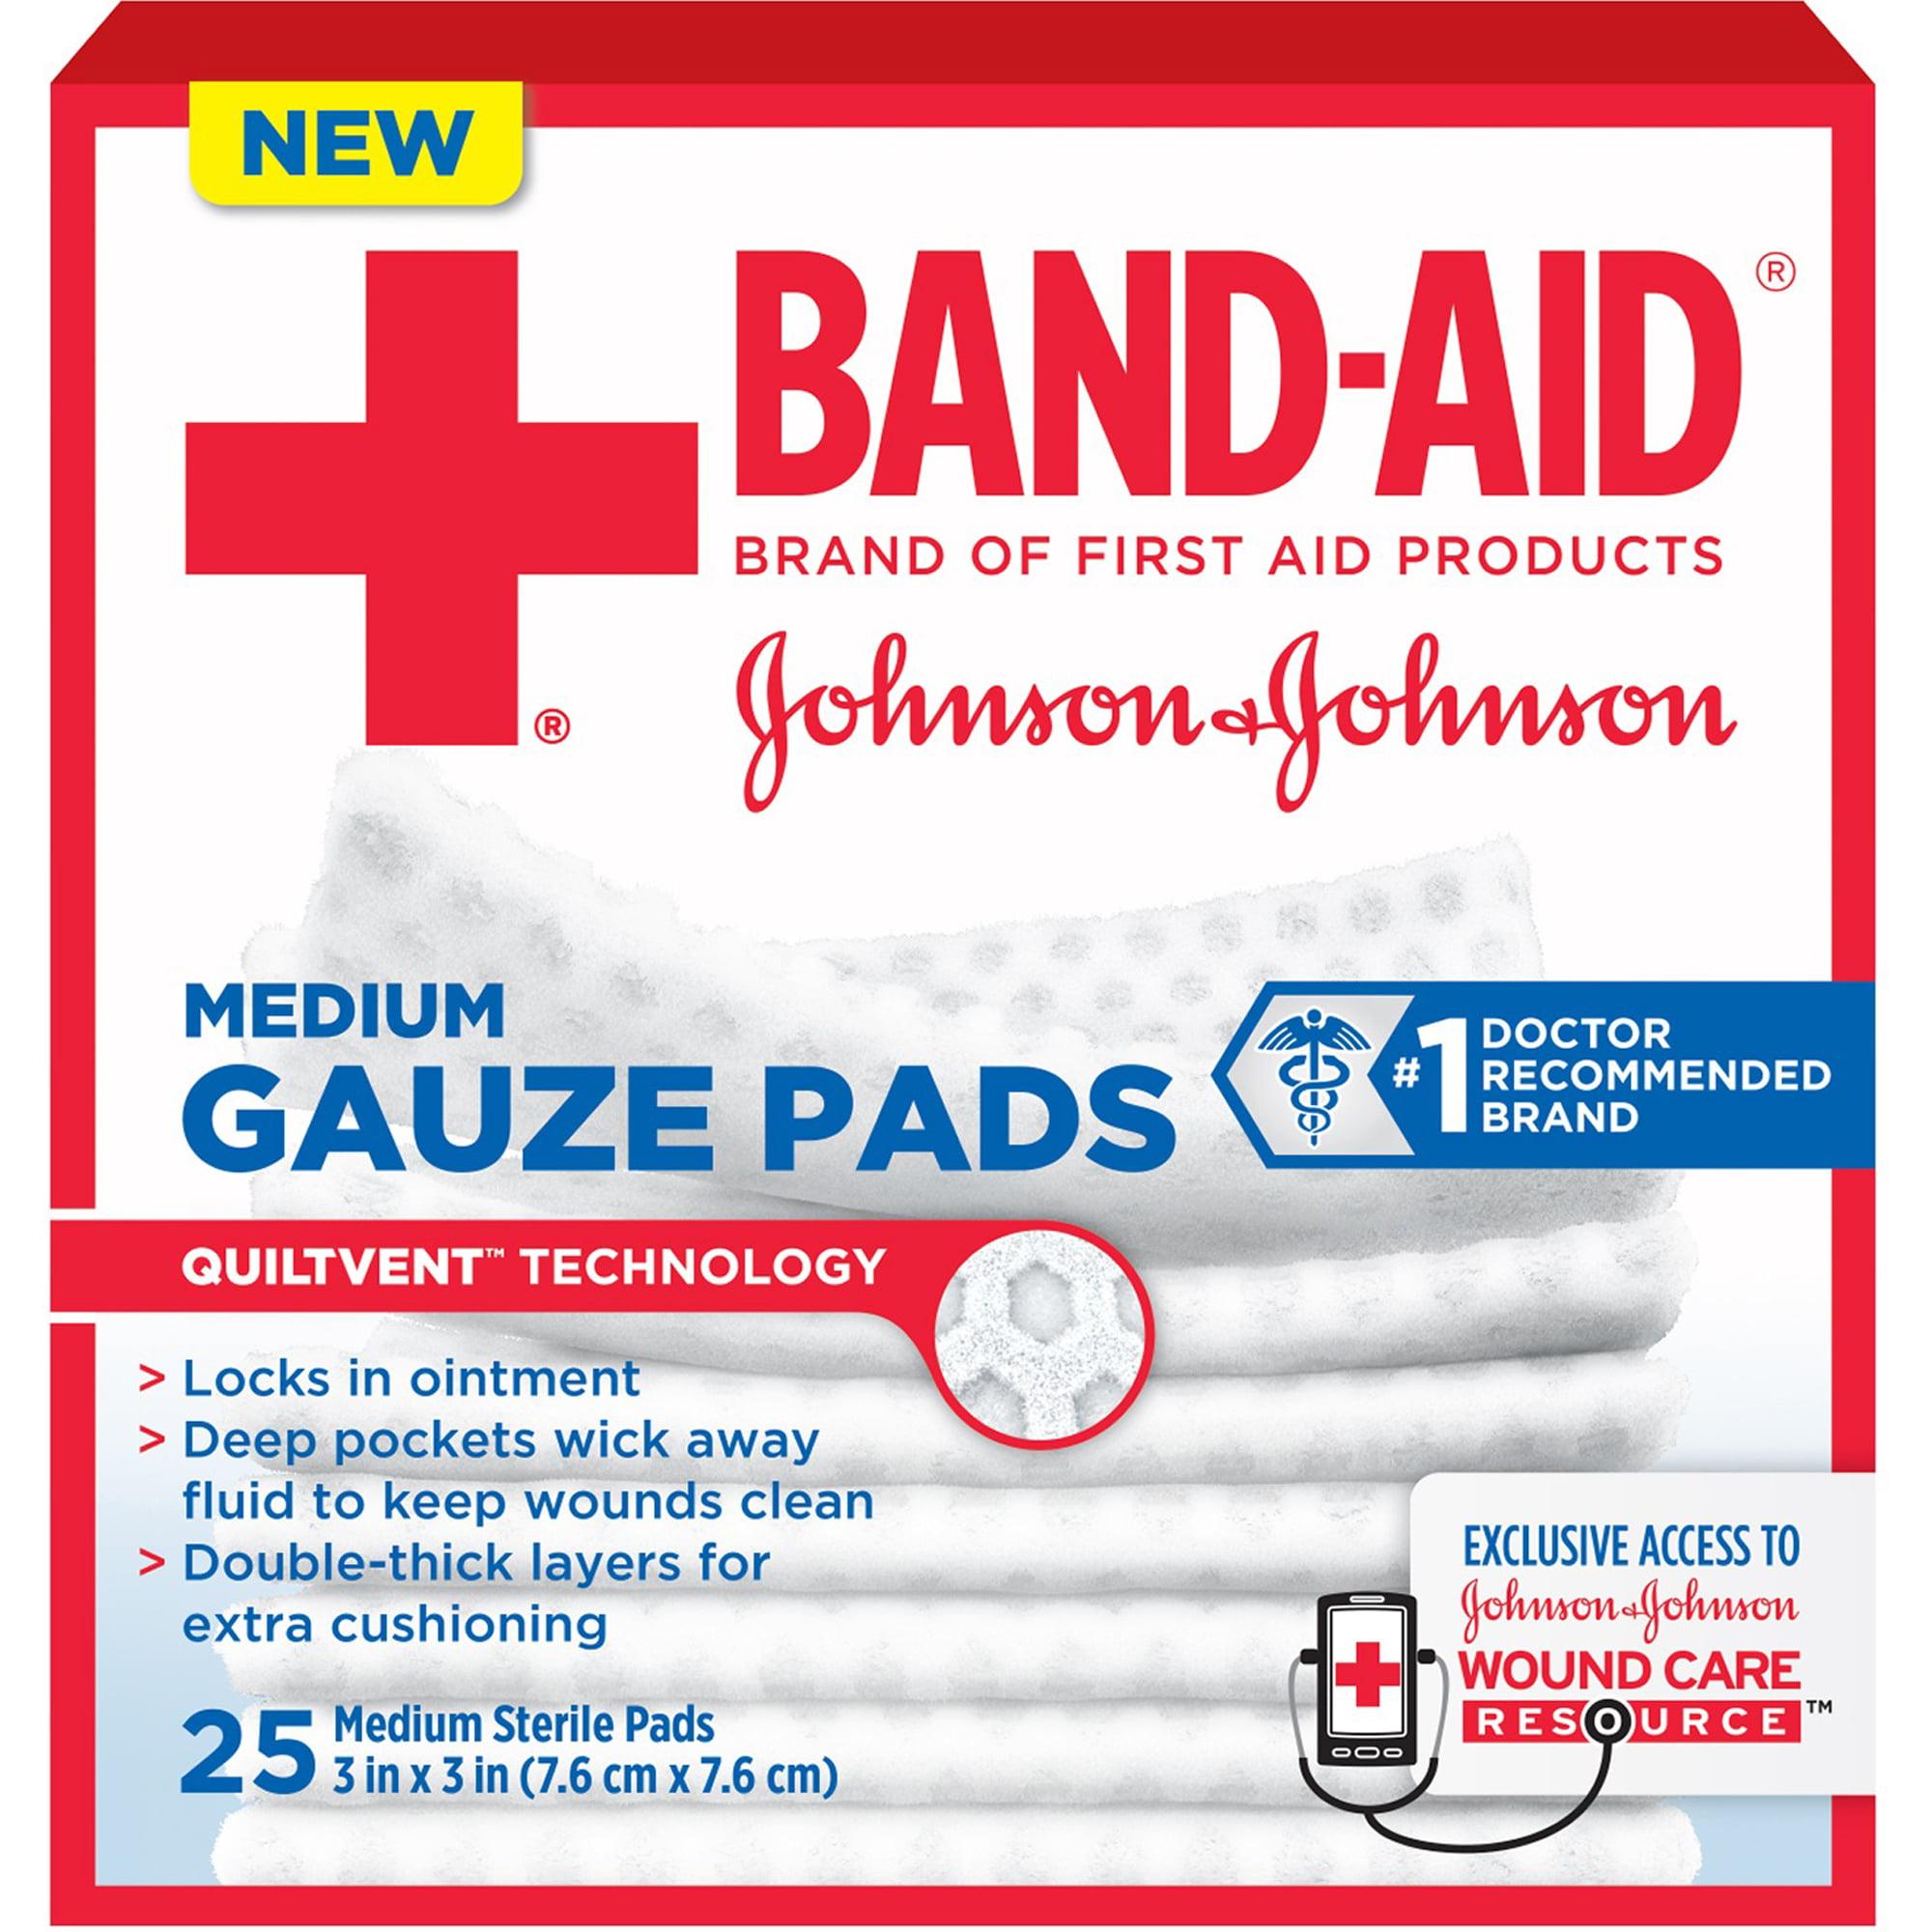 Band-Aid Gauze Pads, Medium, 25 count